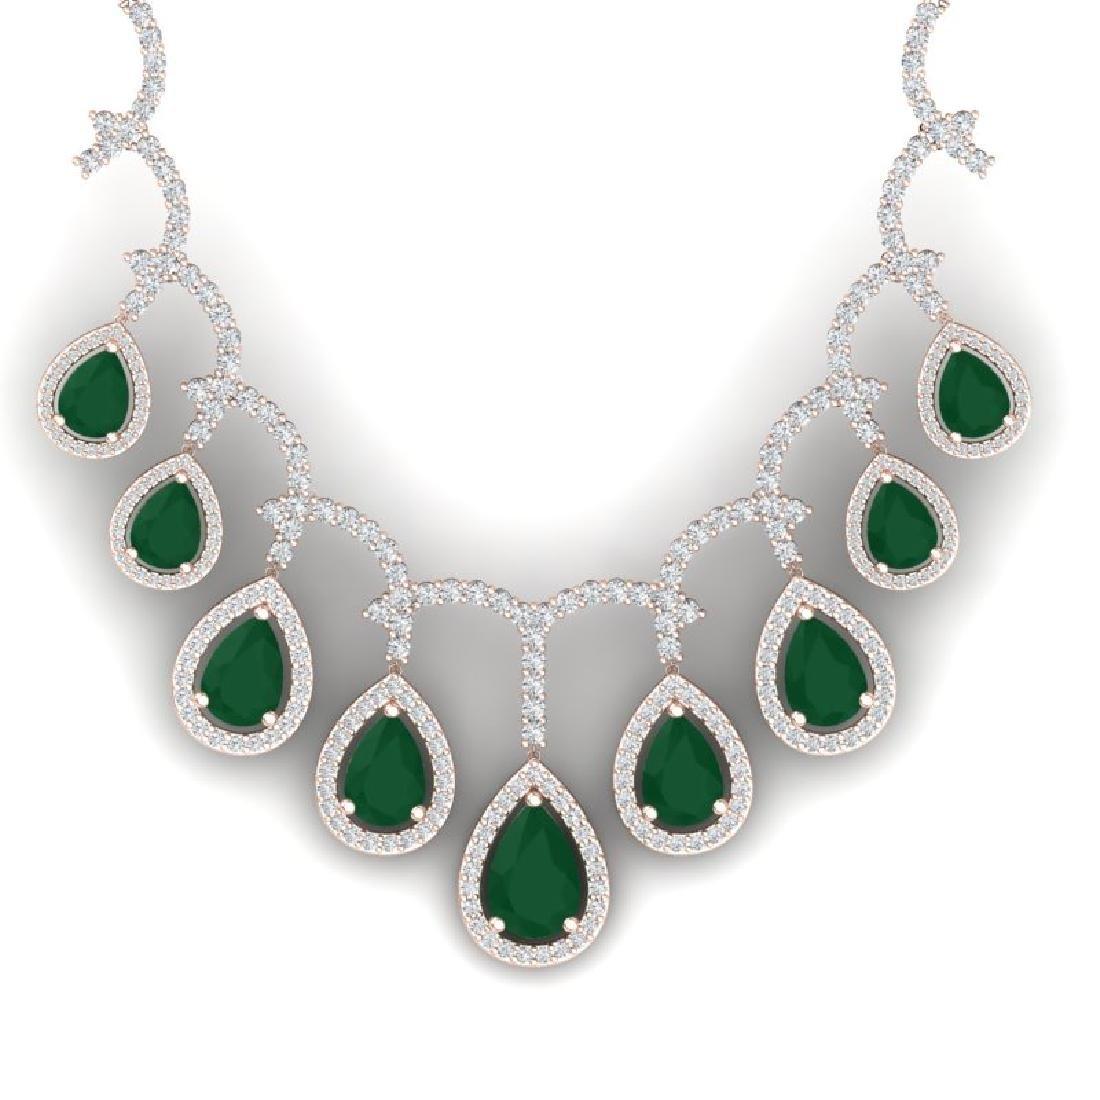 31.5 CTW Royalty Emerald & VS Diamond Necklace 18K Rose